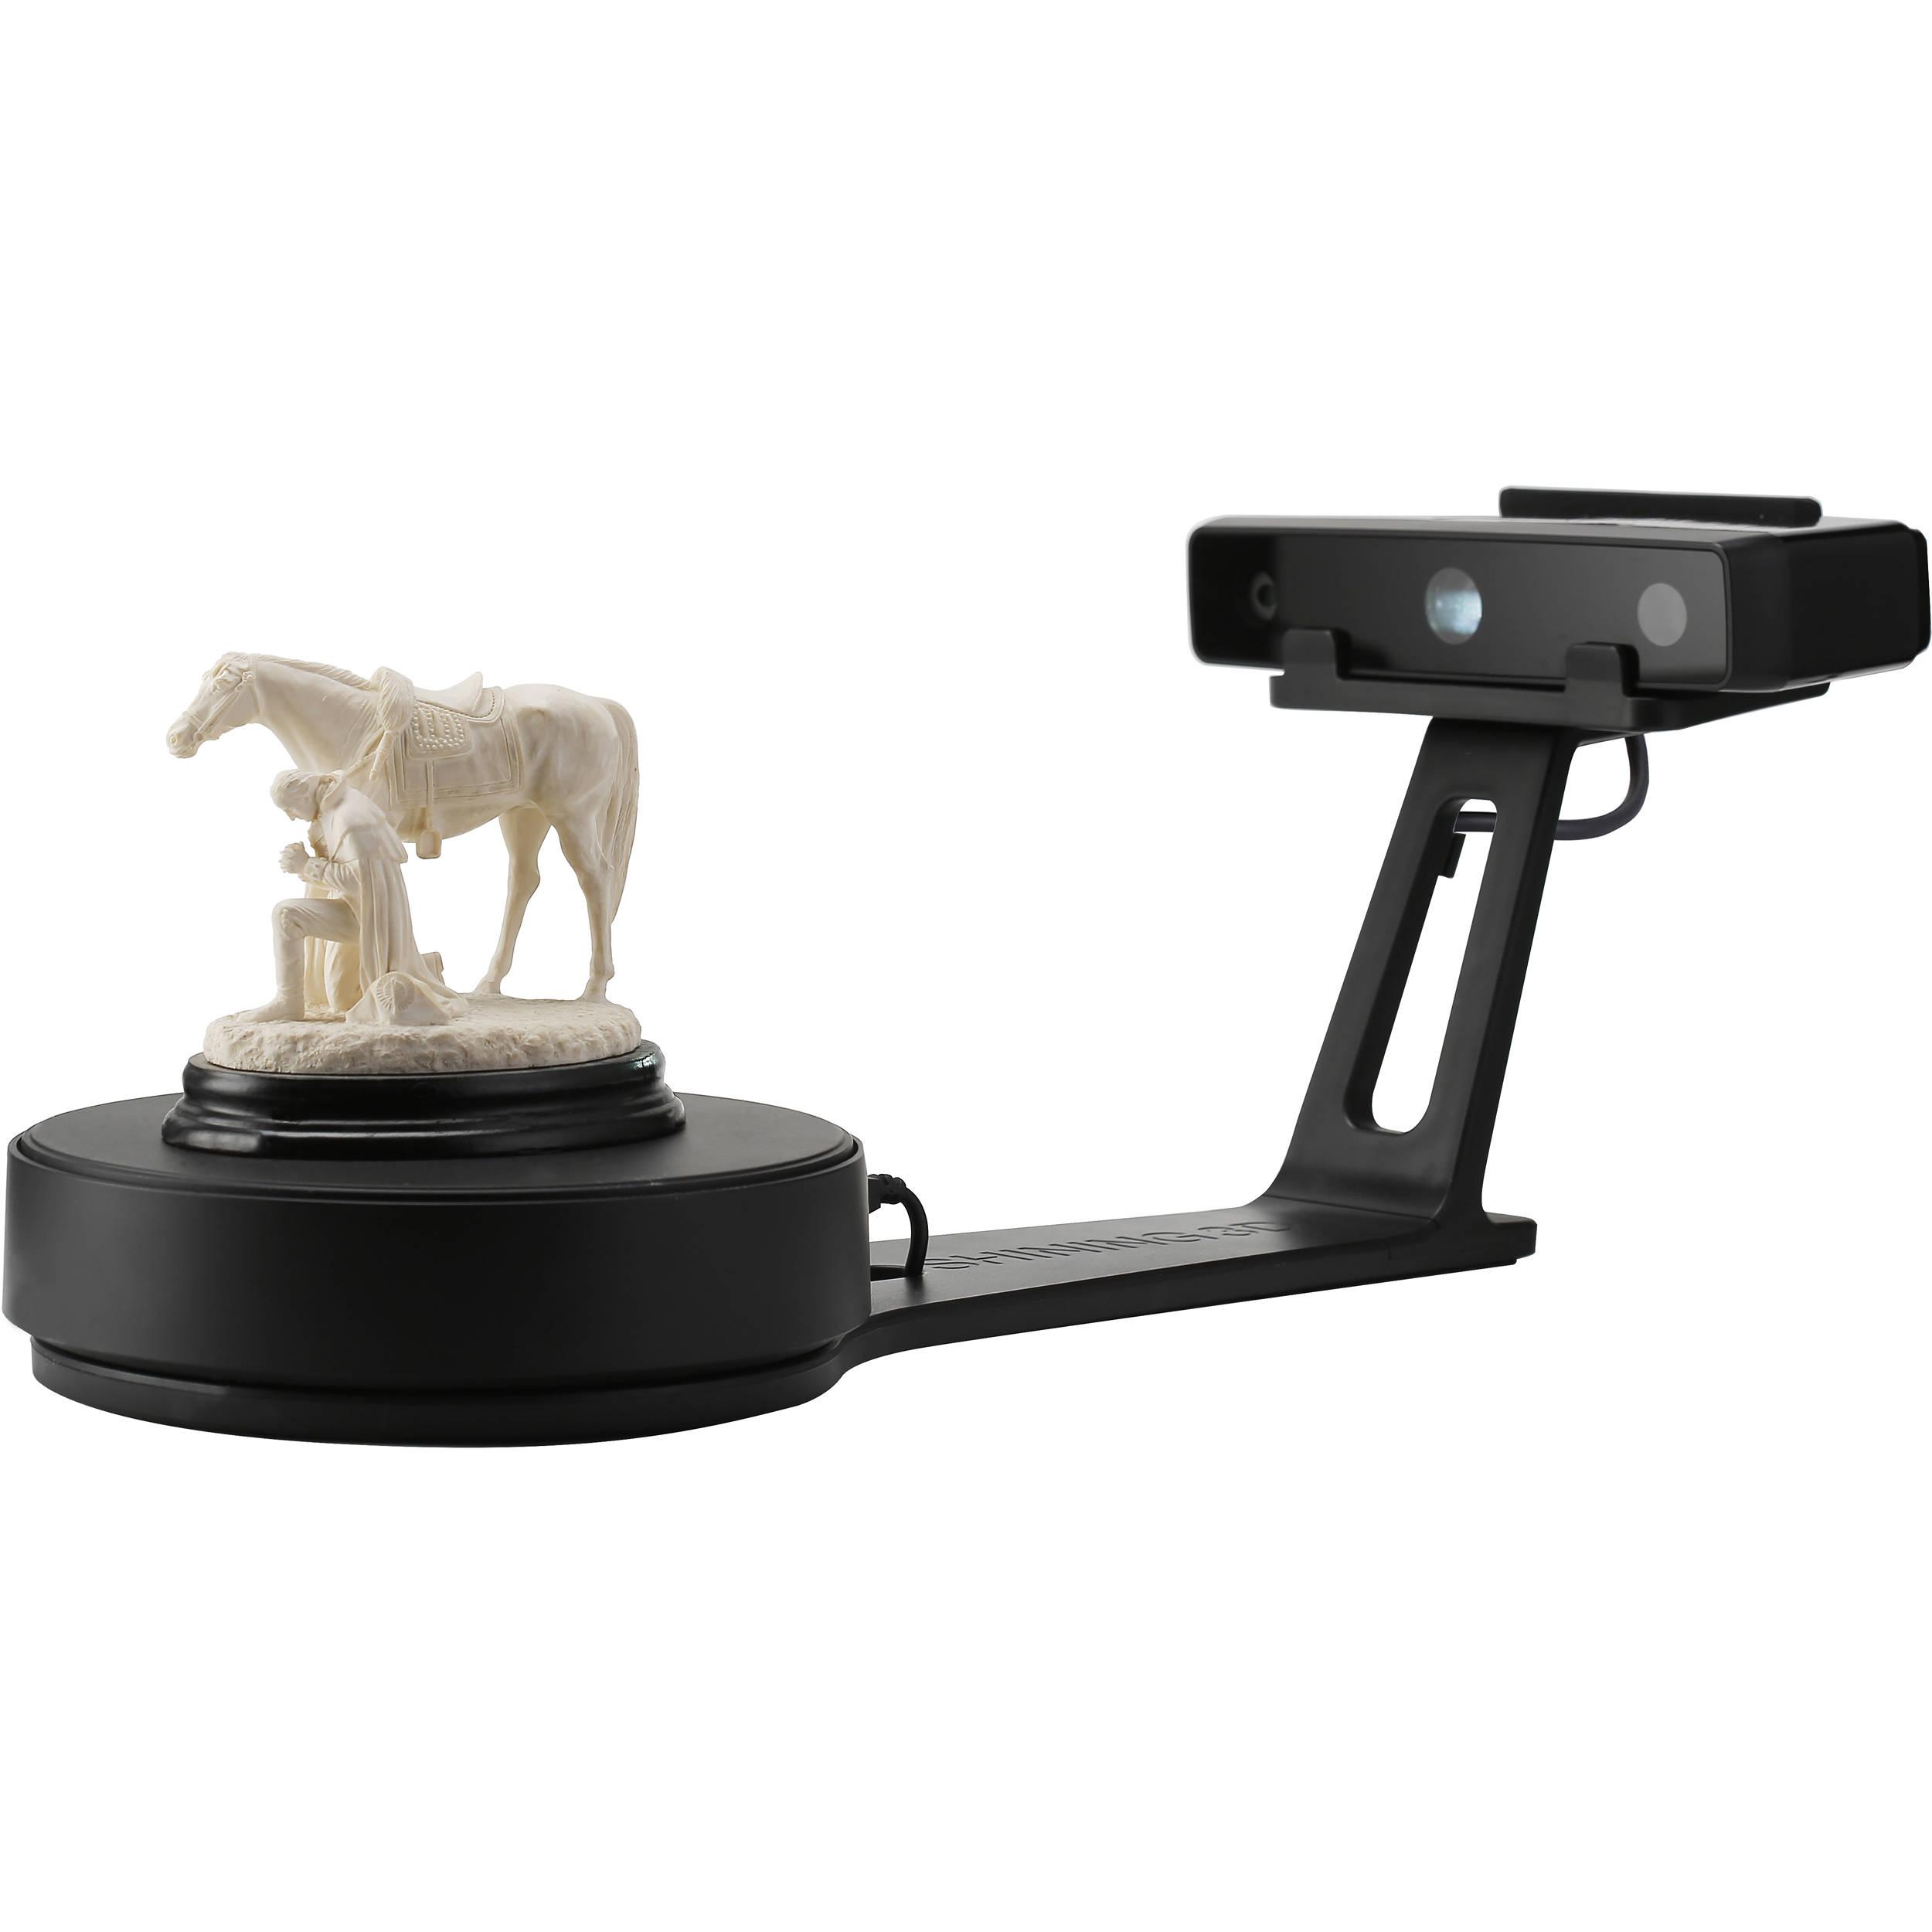 Afinia EinScan-SE (Elite) 3D Scanner with Turntable